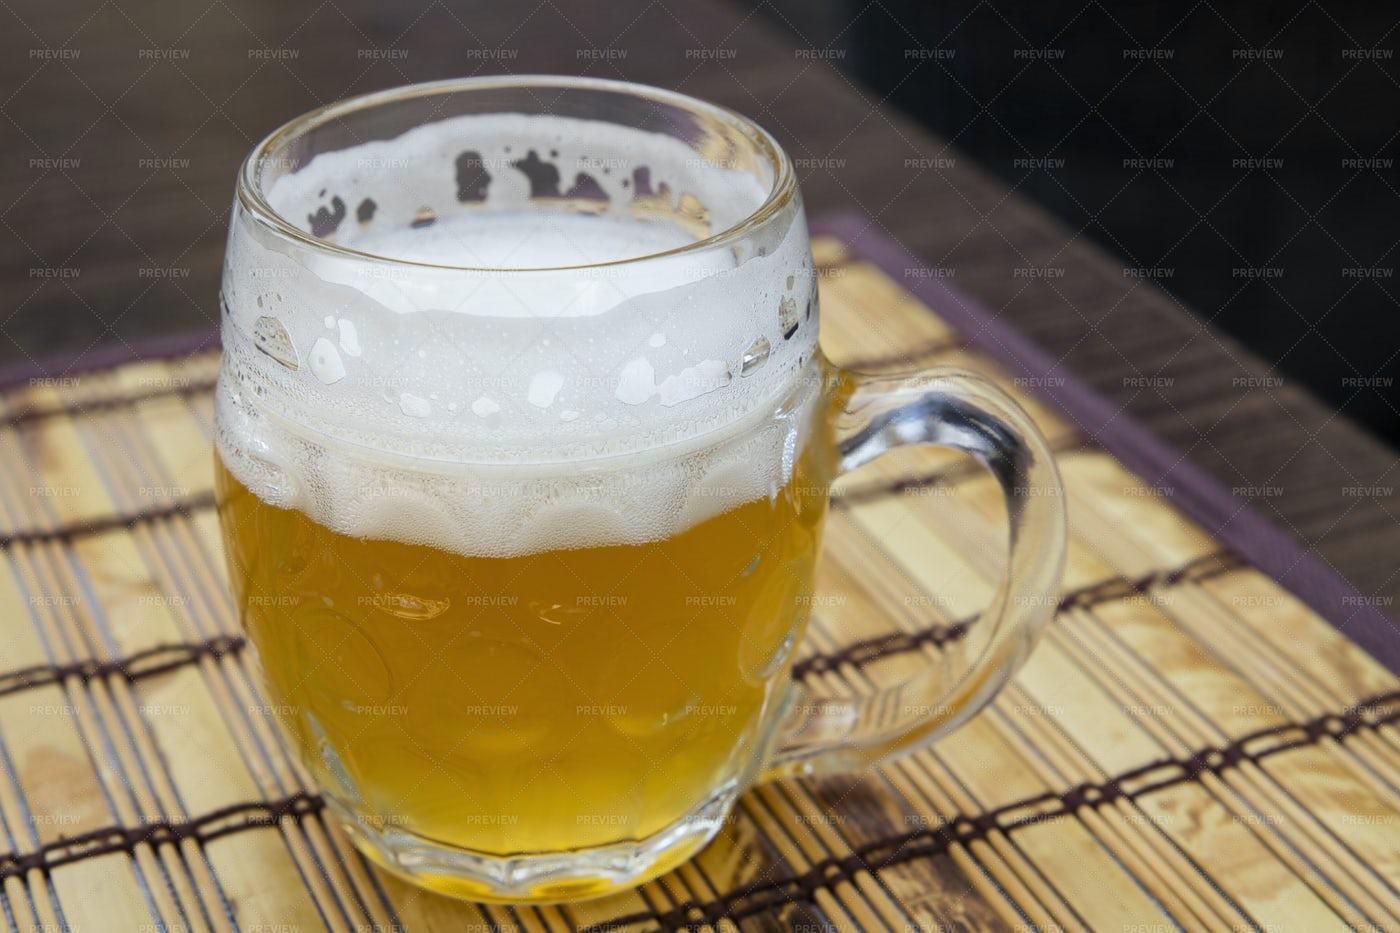 Glass Mug Of Wheat Beer: Stock Photos